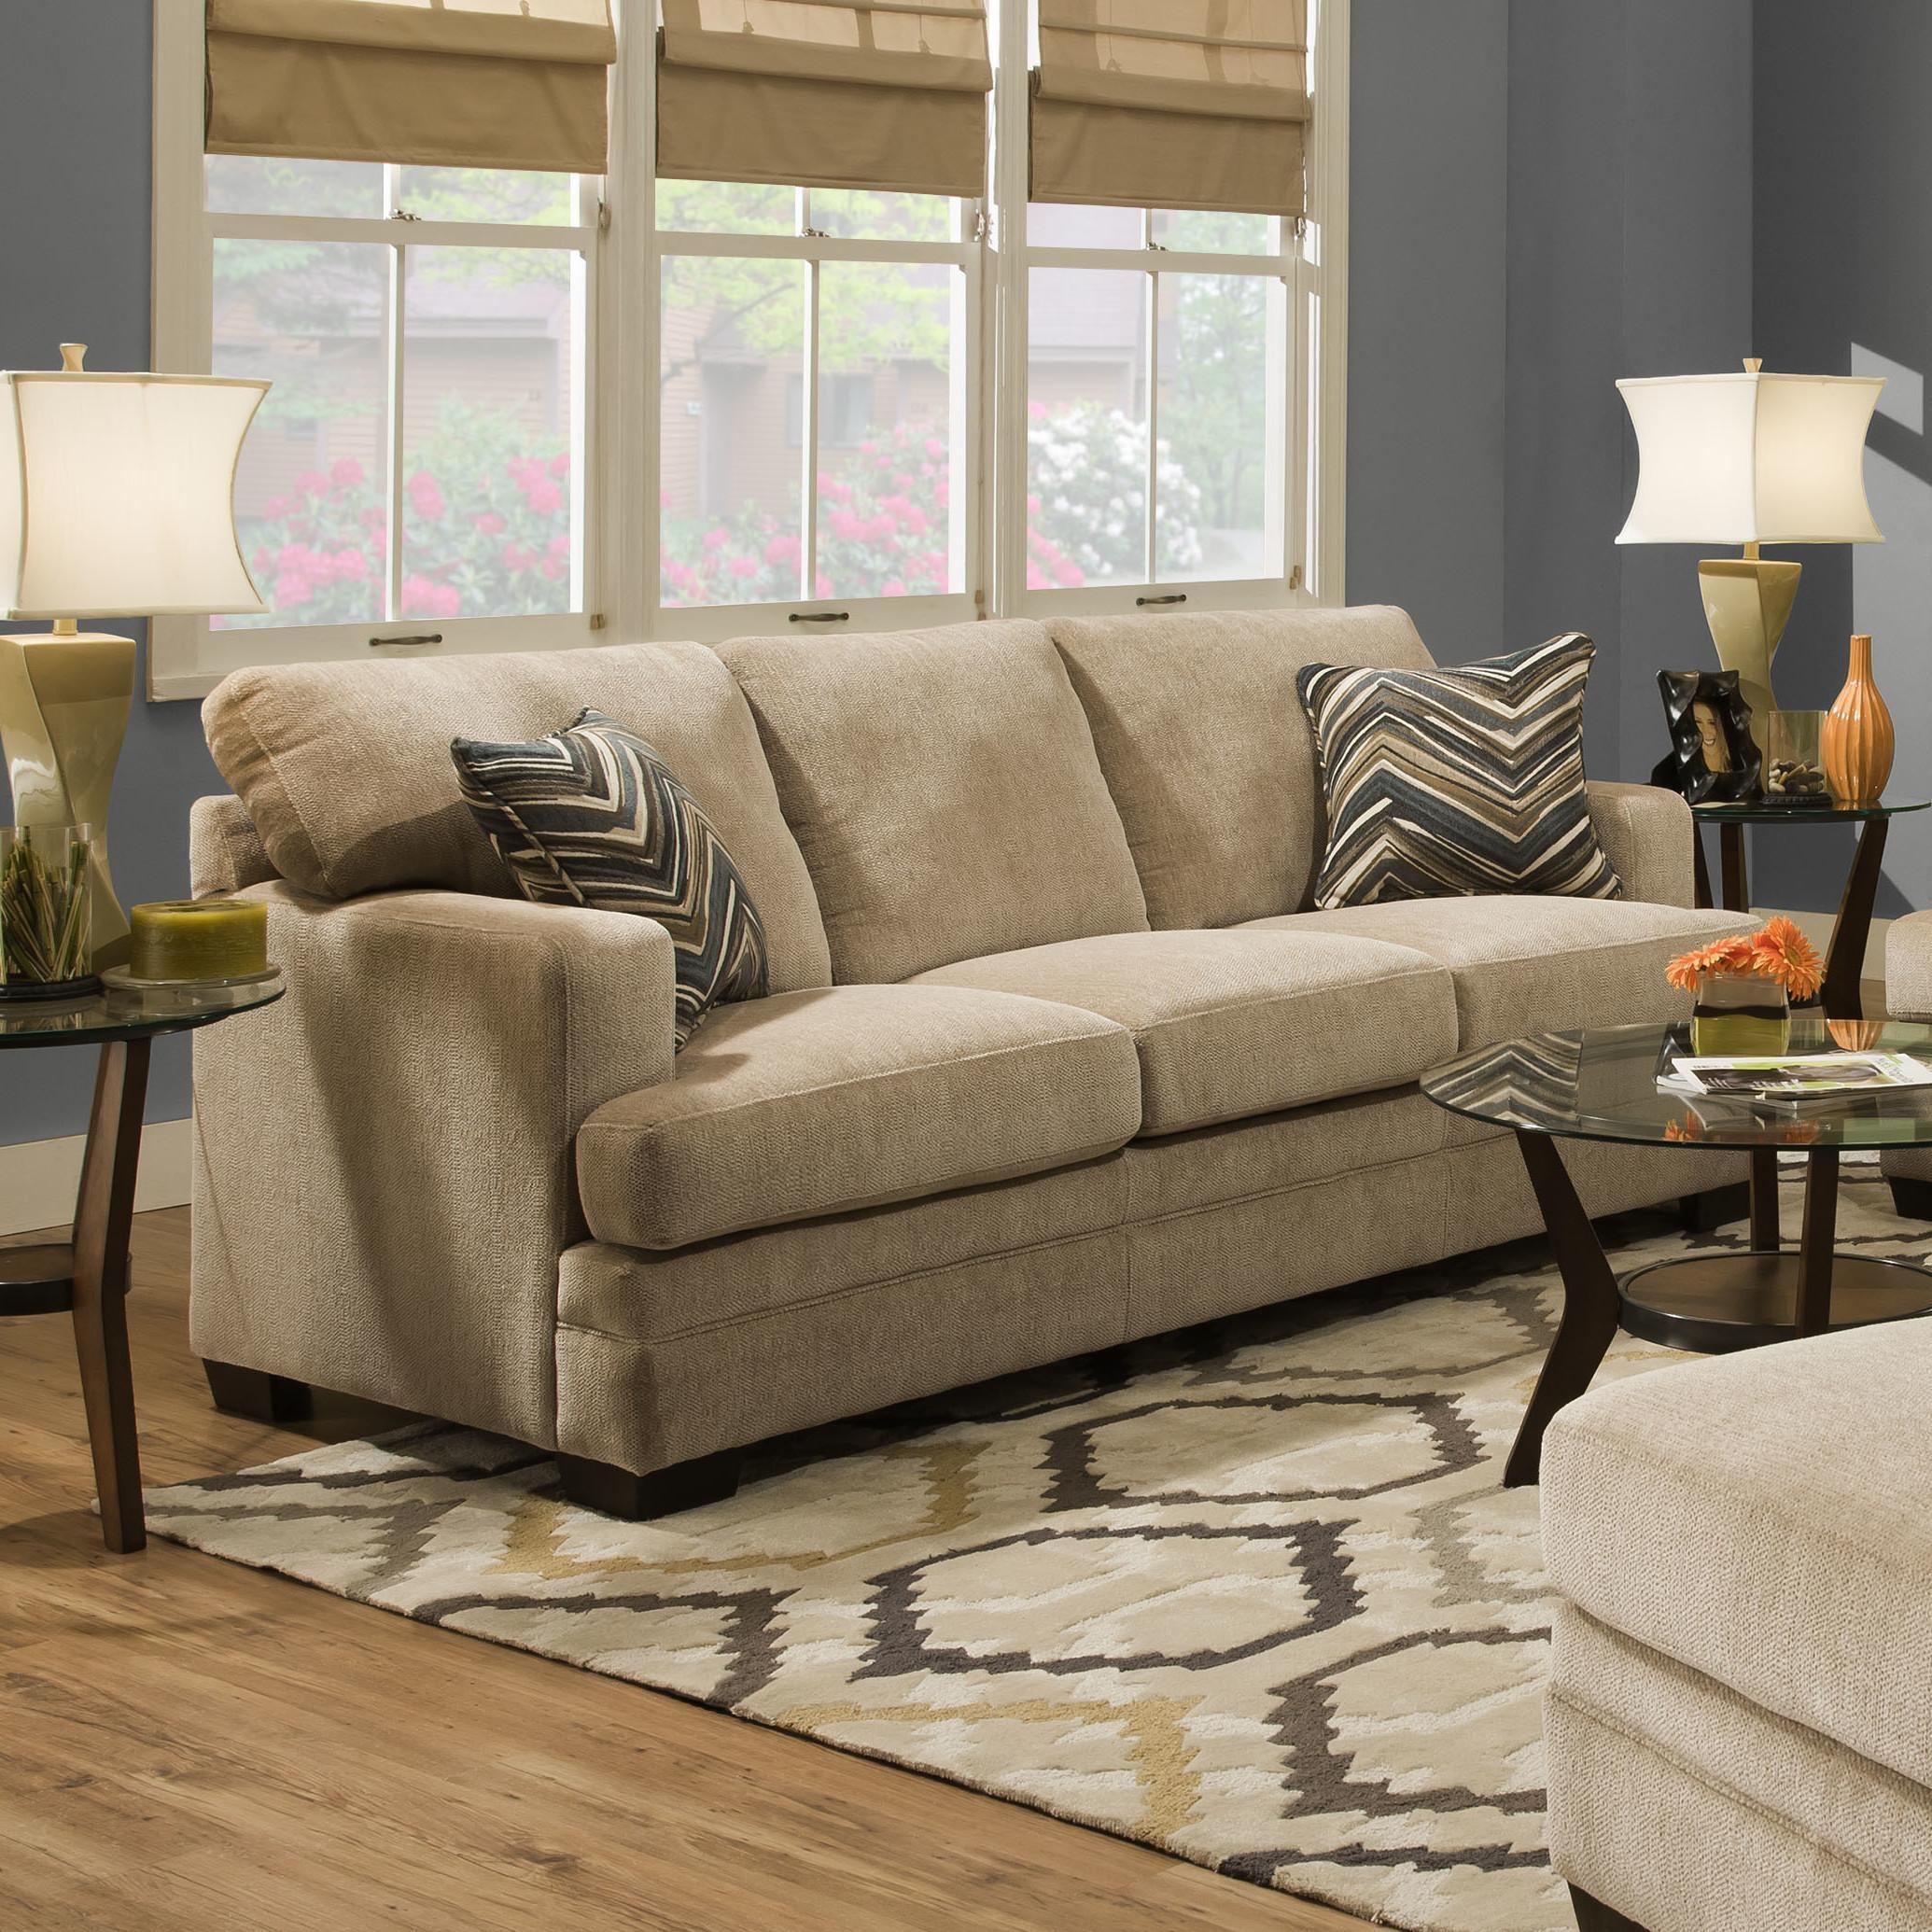 20 inspirations simmons sofa beds sofa ideas for Simmons sofa bed reviews